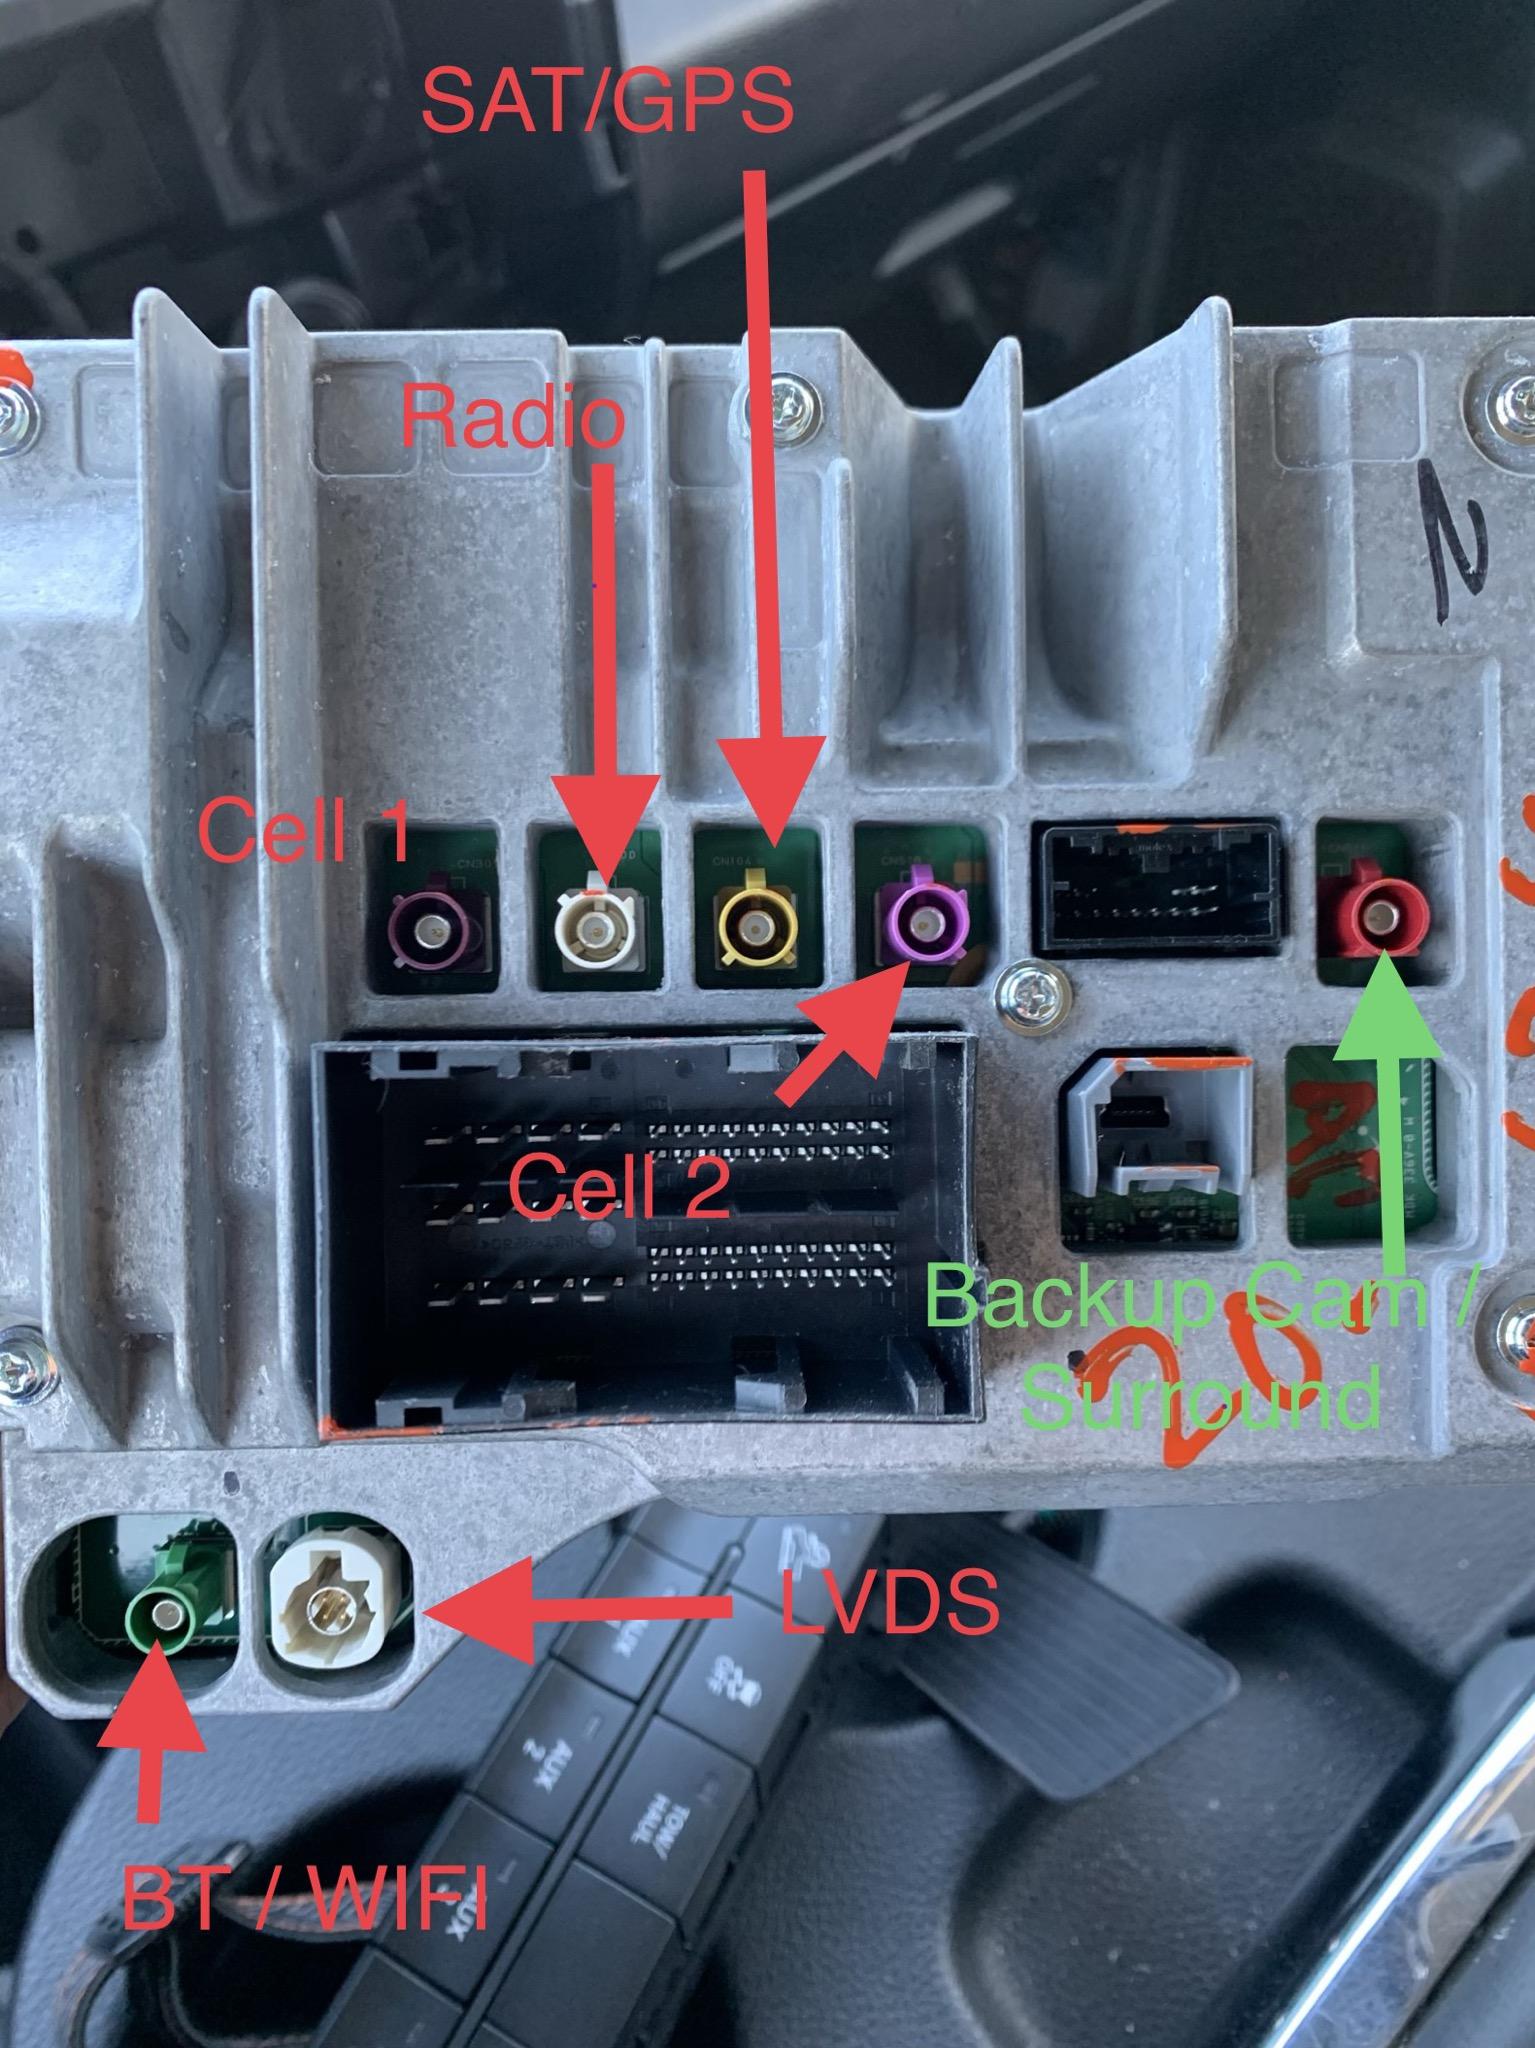 harman vp4 gps radio uconnect 8.4 wiring diagram   jeep garage - jeep forum  jeep garage